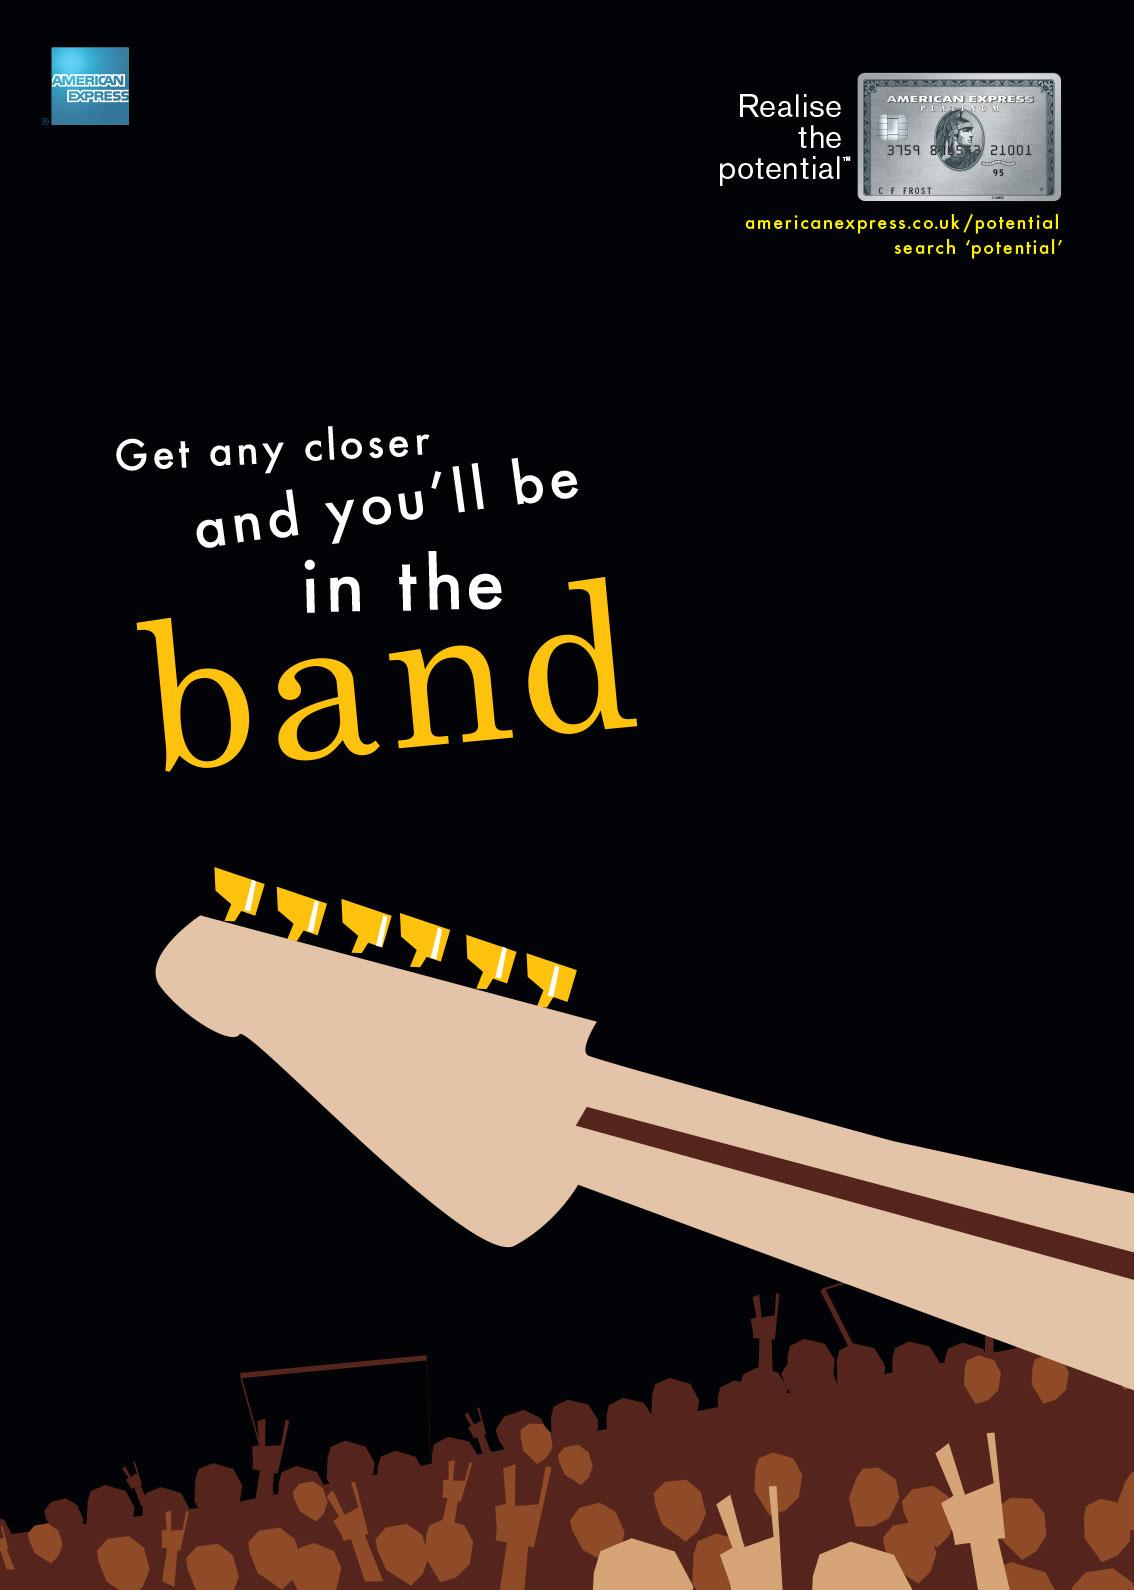 American Express Advert by Ogilvy